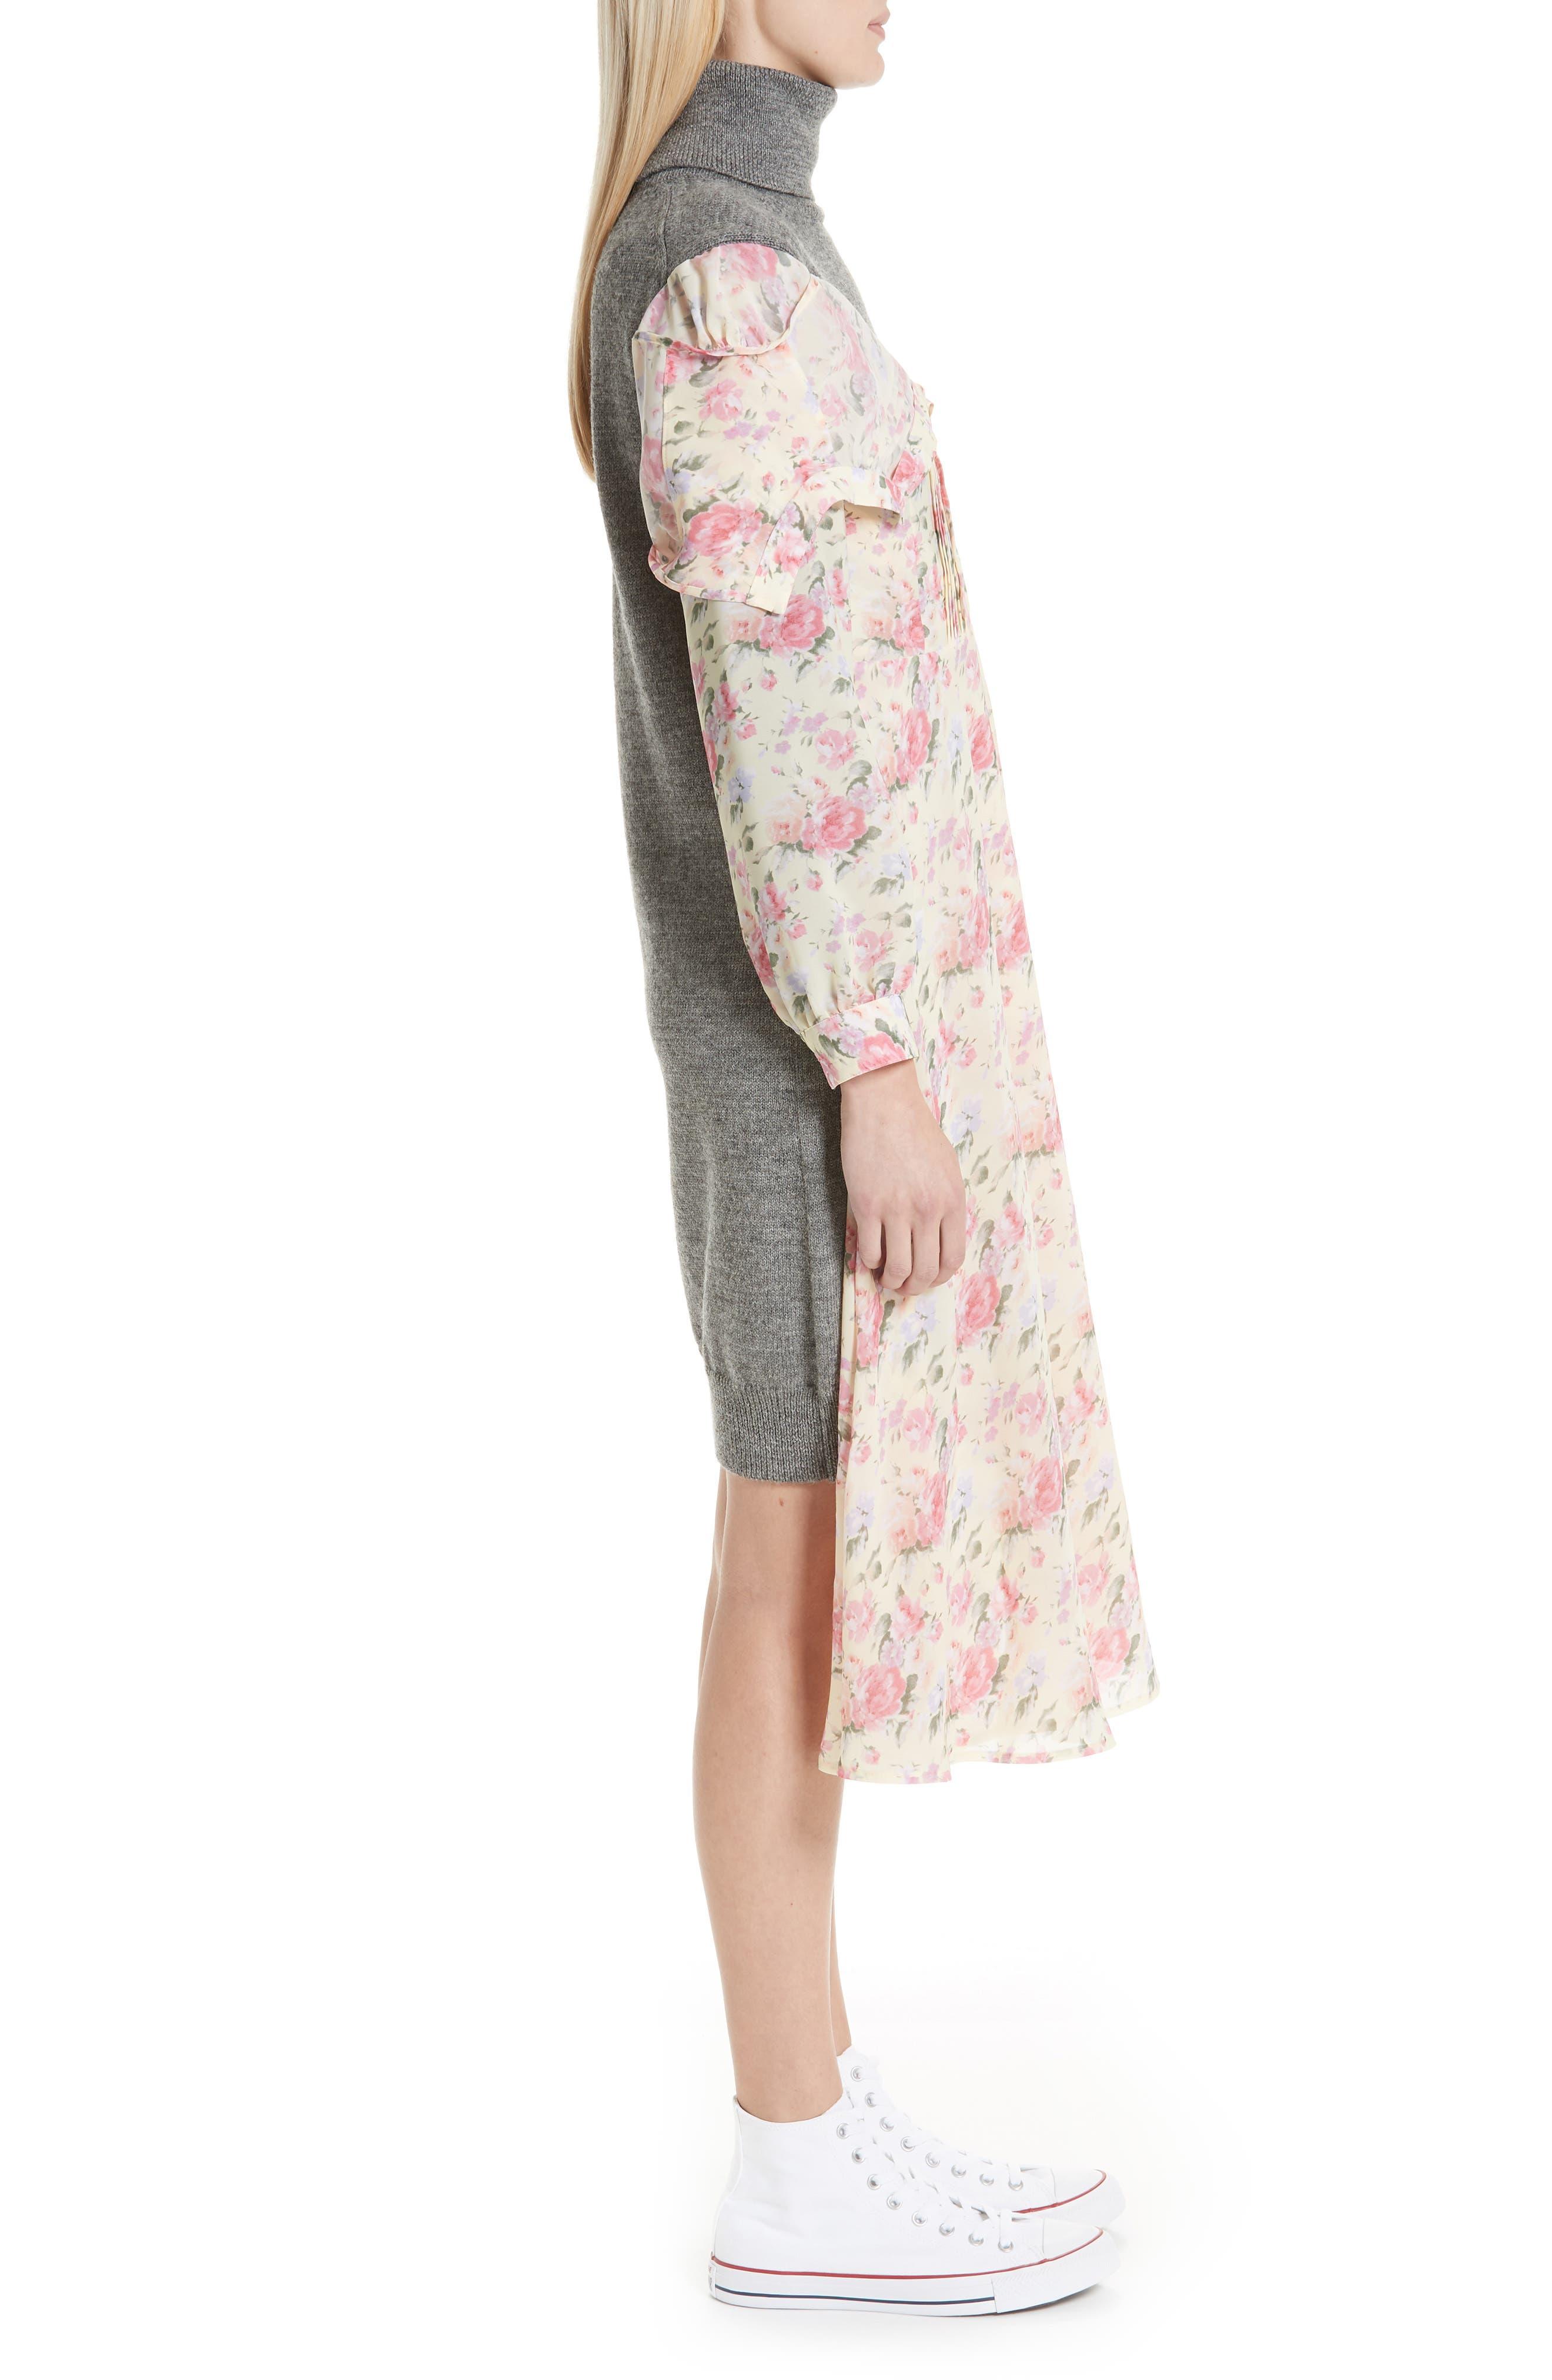 Mixed Media Floral Turtleneck Dress,                             Alternate thumbnail 3, color,                             YELLOW/ PINK/ PPL/ GREY